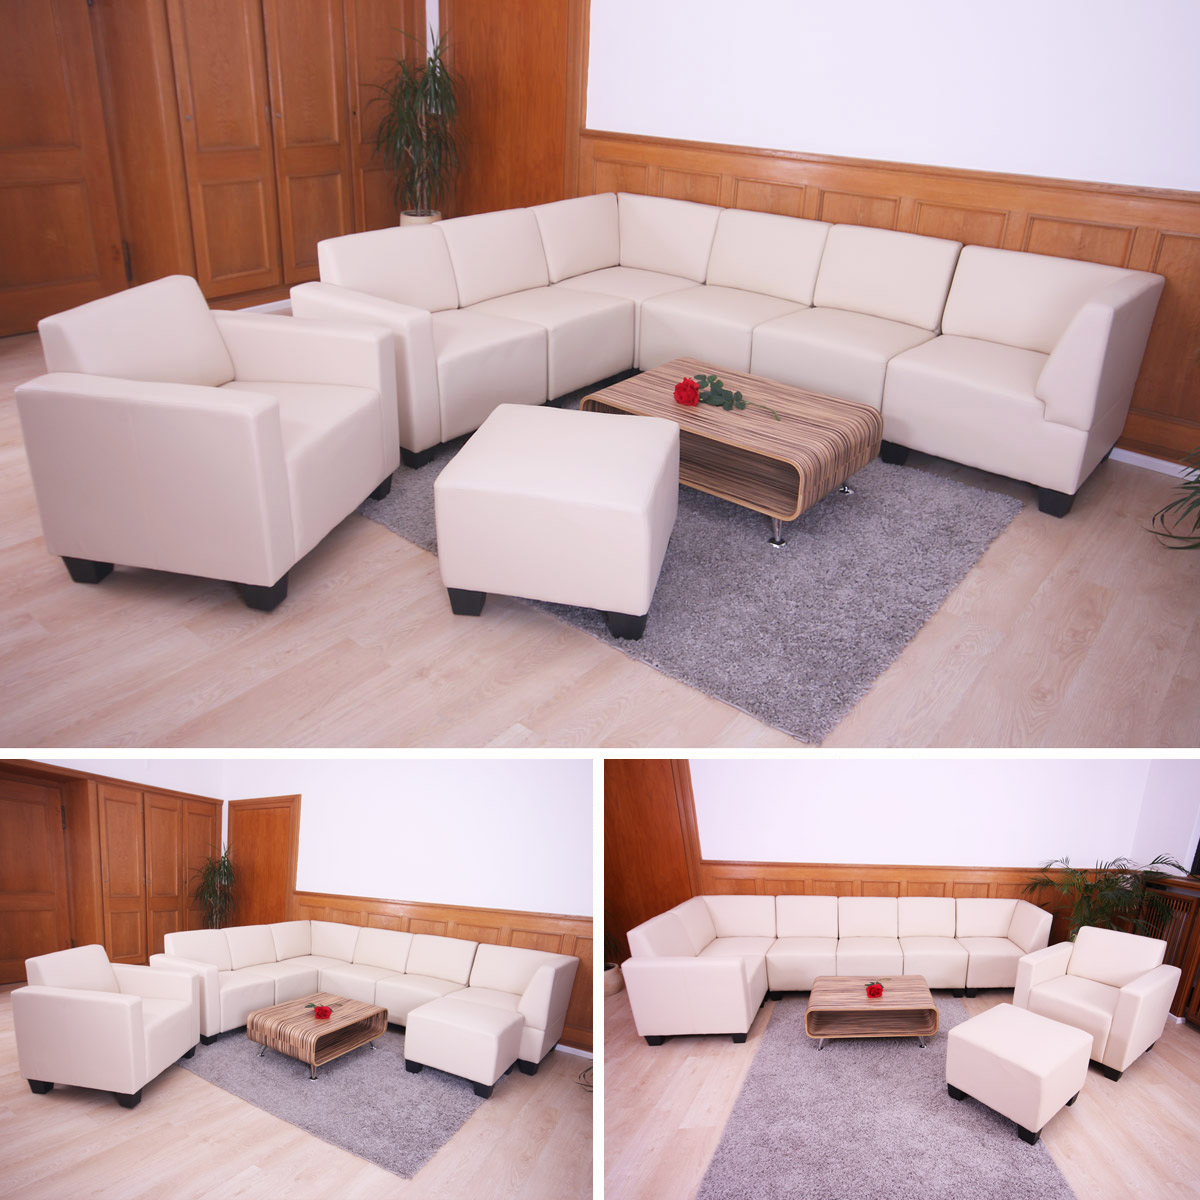 Modular sofa system couch garnitur lyon 6 1 1 kunstleder for Couch garnitur